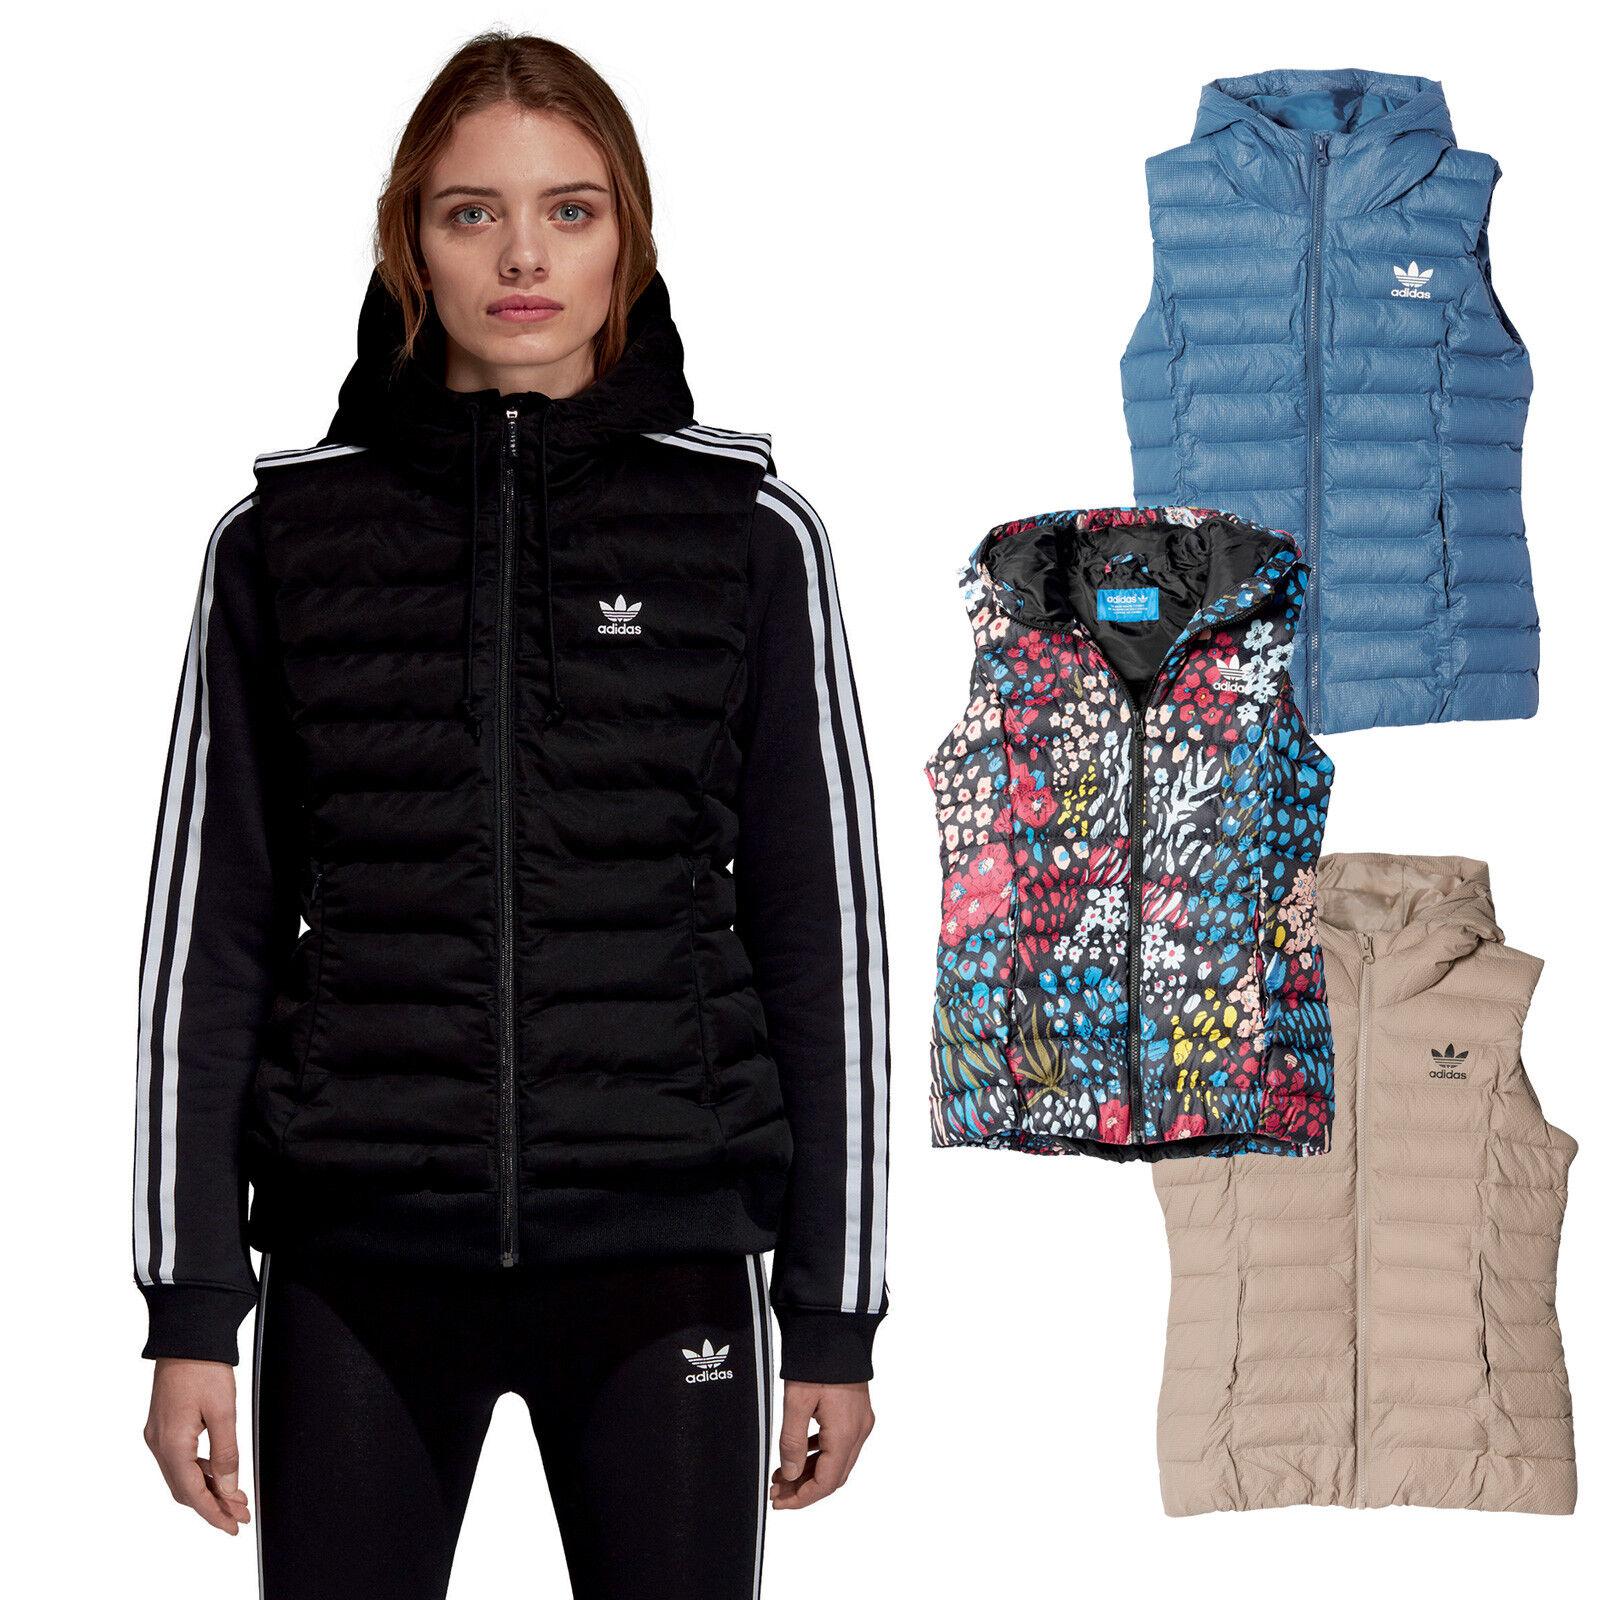 Adidas Originals Ladies-Vest down Vest Winter Vest Slim Vest Quilted Vest